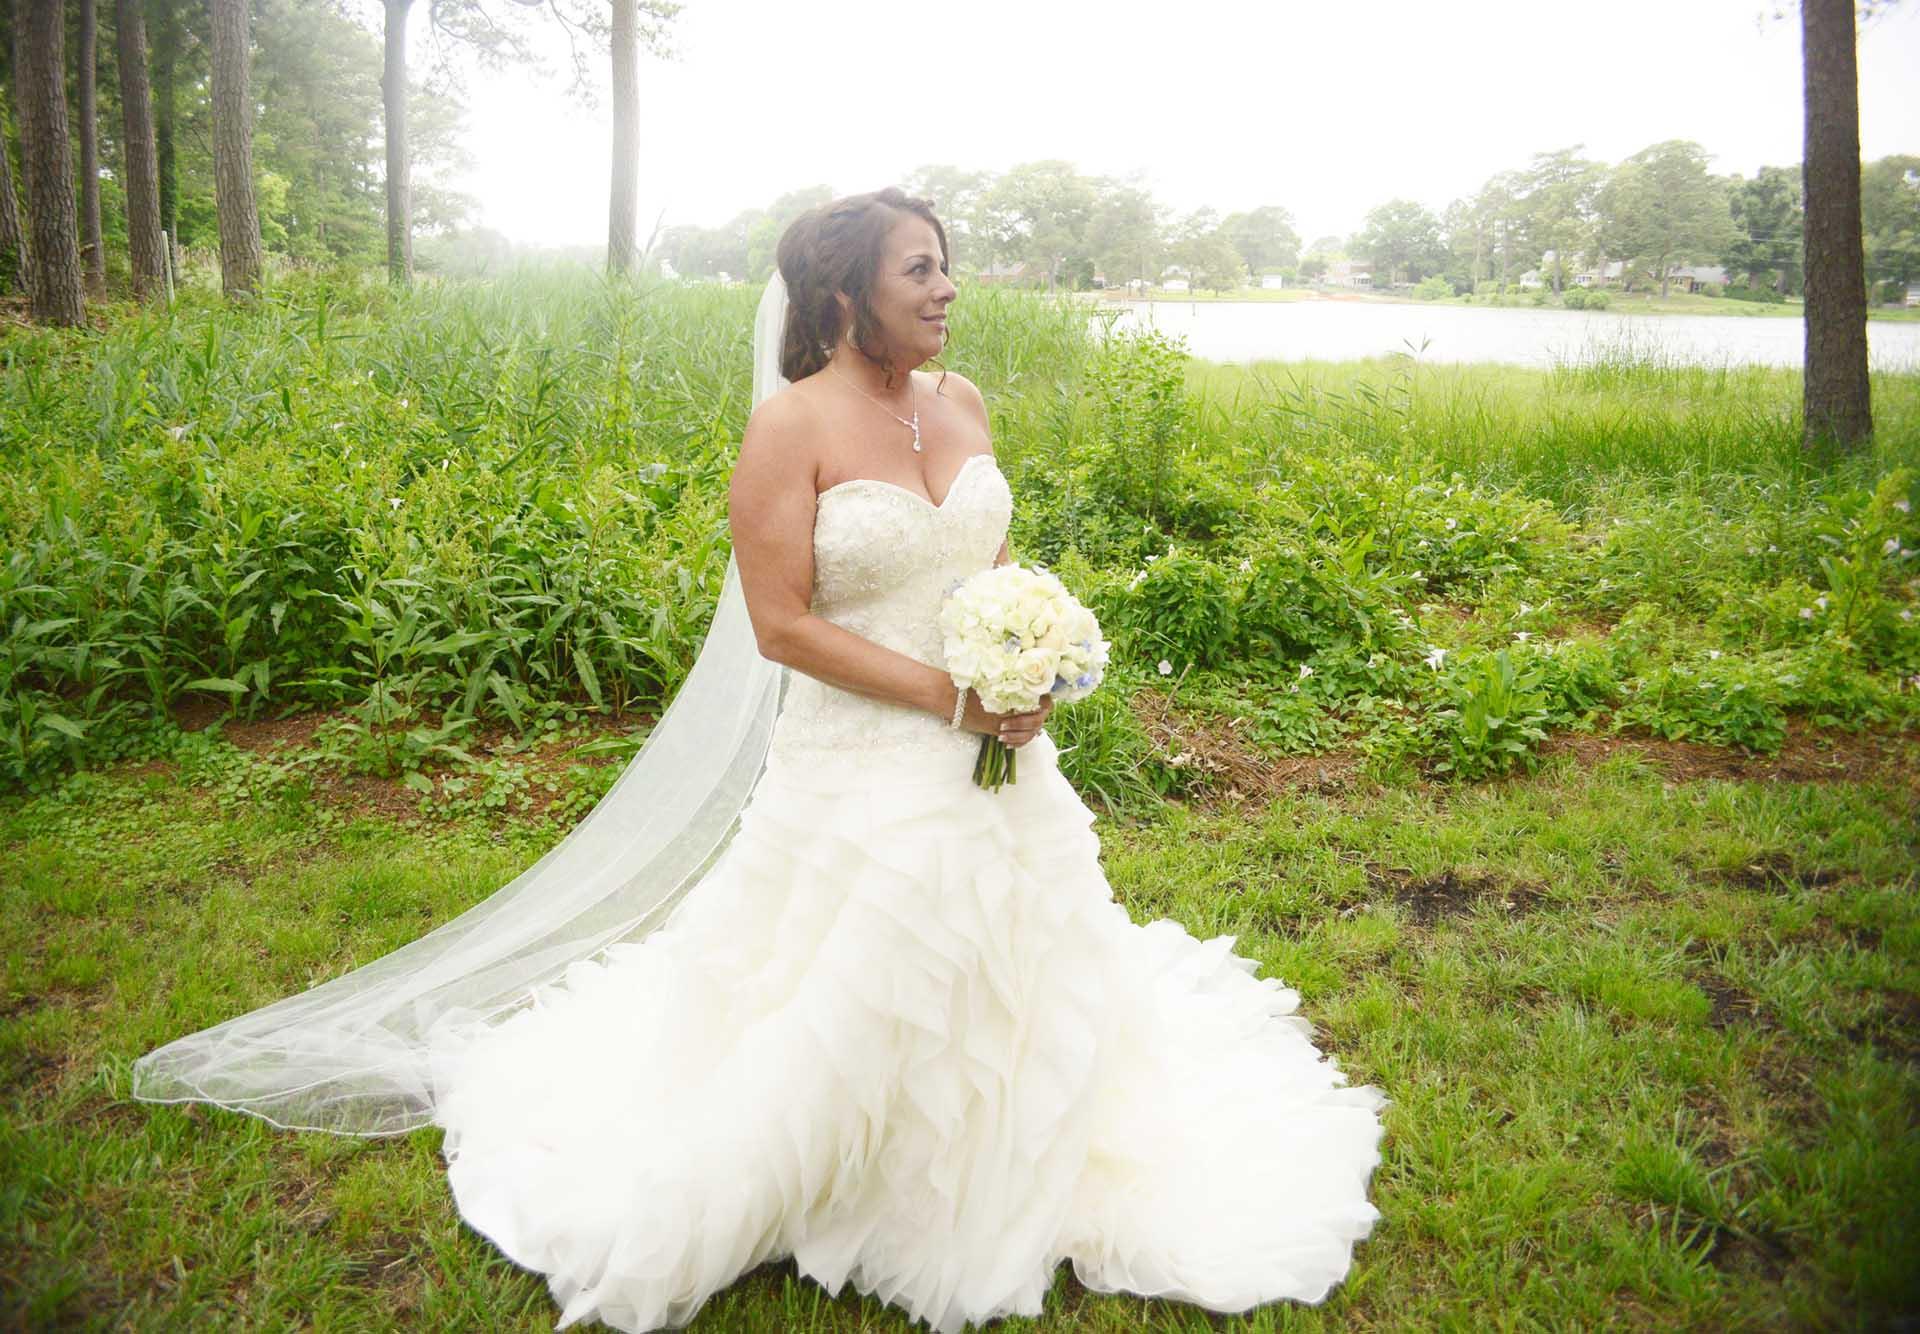 Bride taking wedding photos